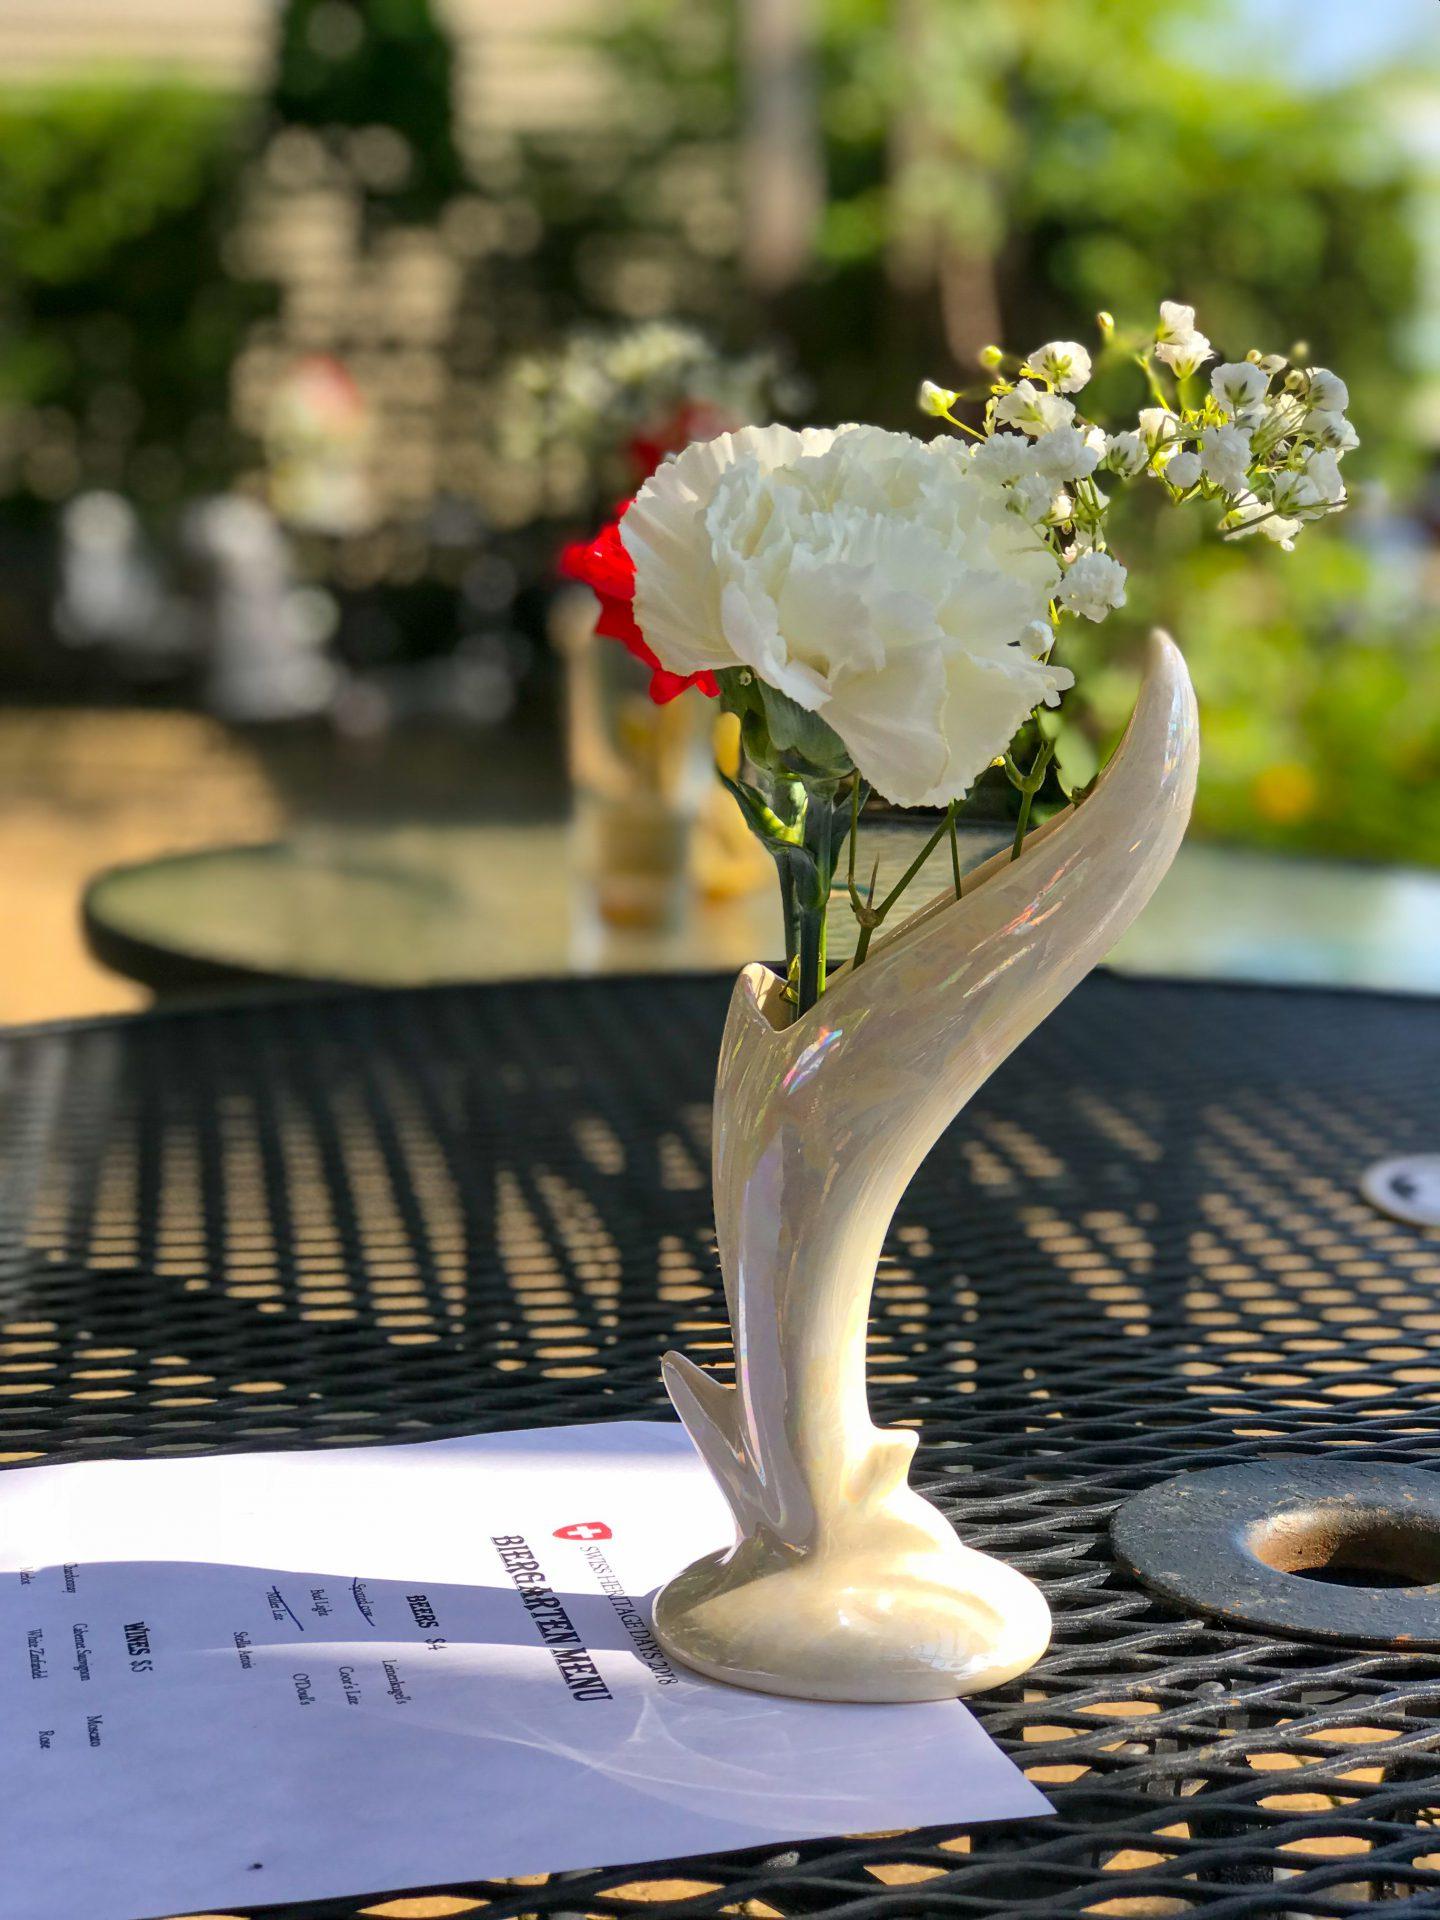 Hotel de Ville patio dining table